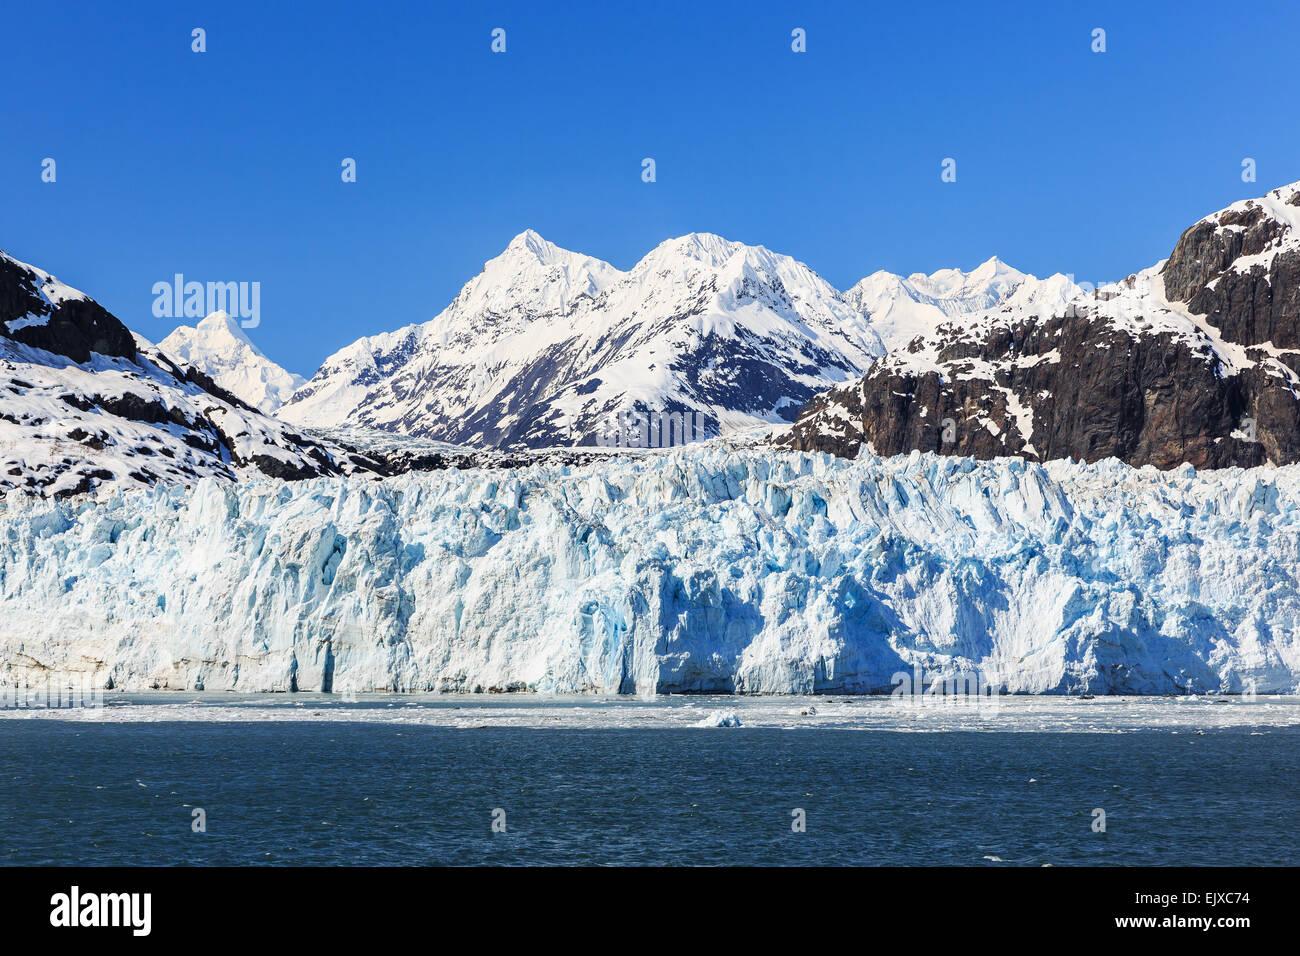 Glacier Bay National Park, Alaska - Stock Image